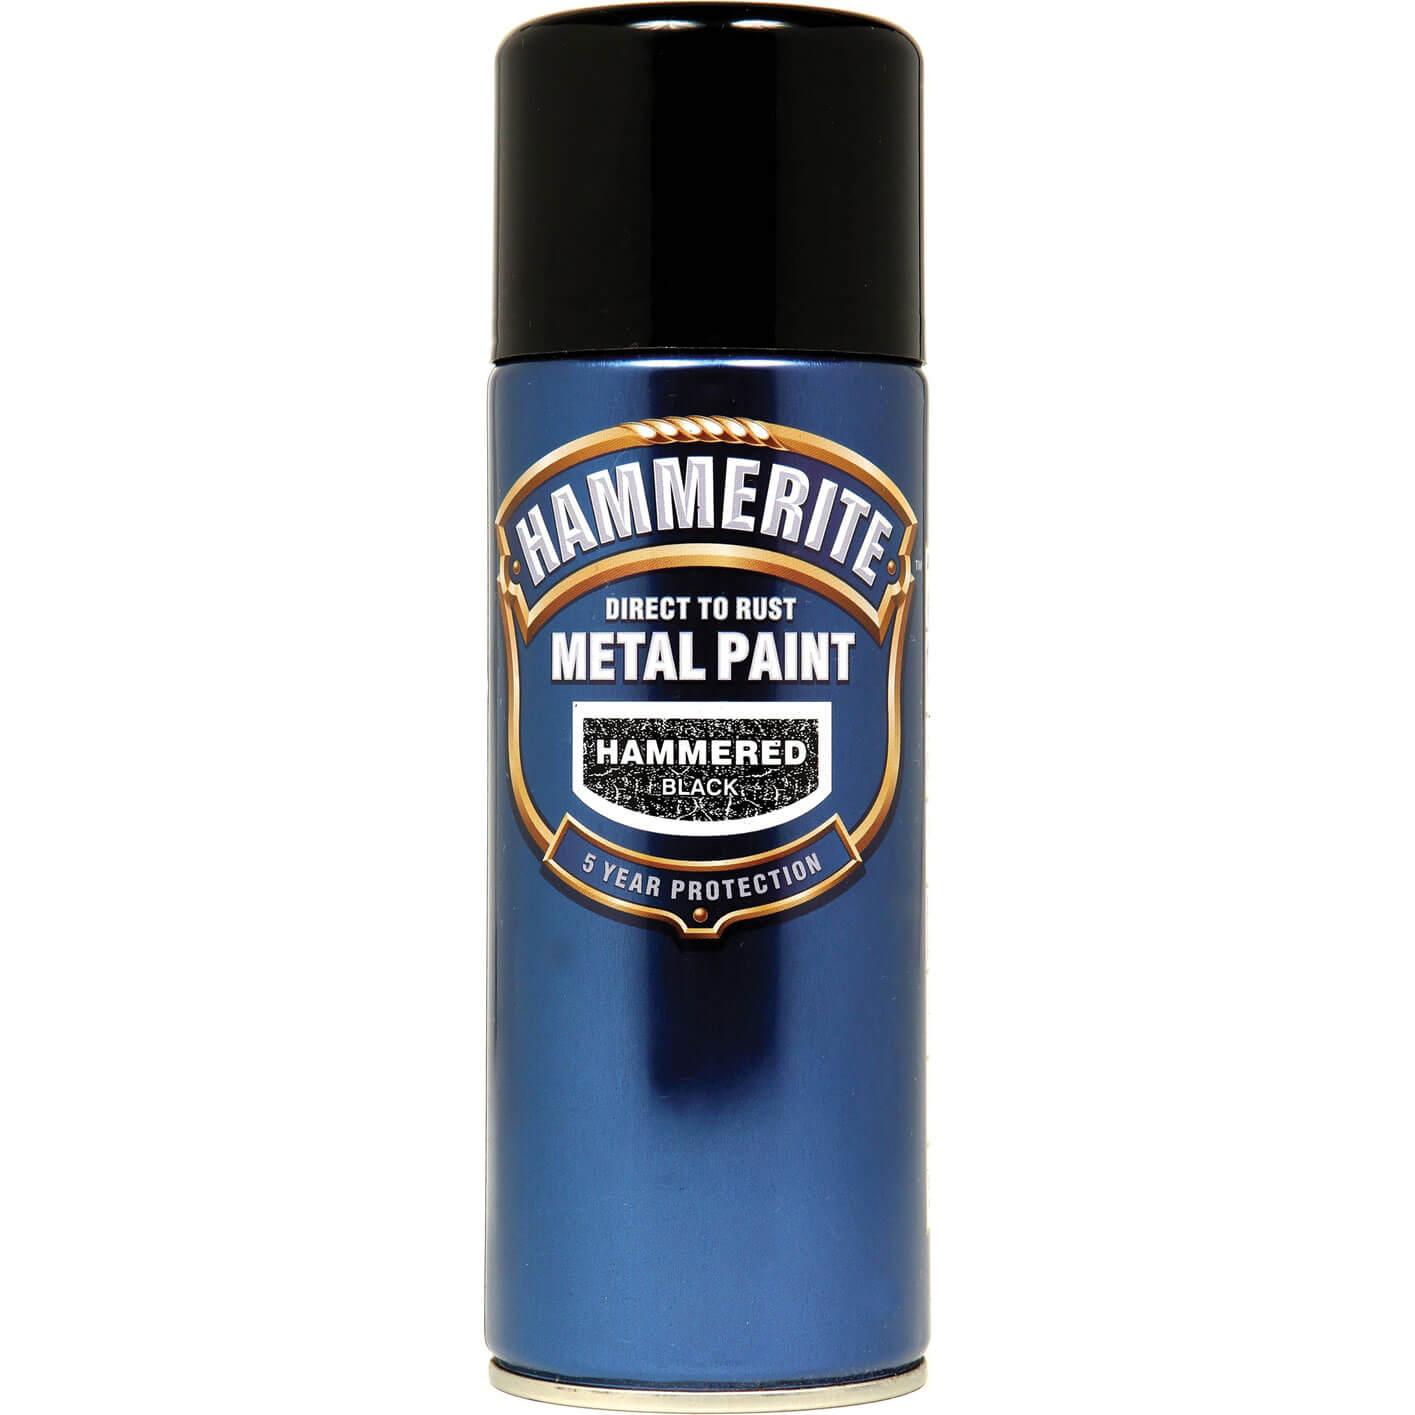 Image of Hammerite Hammered Finish Metal Paint Aerosol Black 400ml